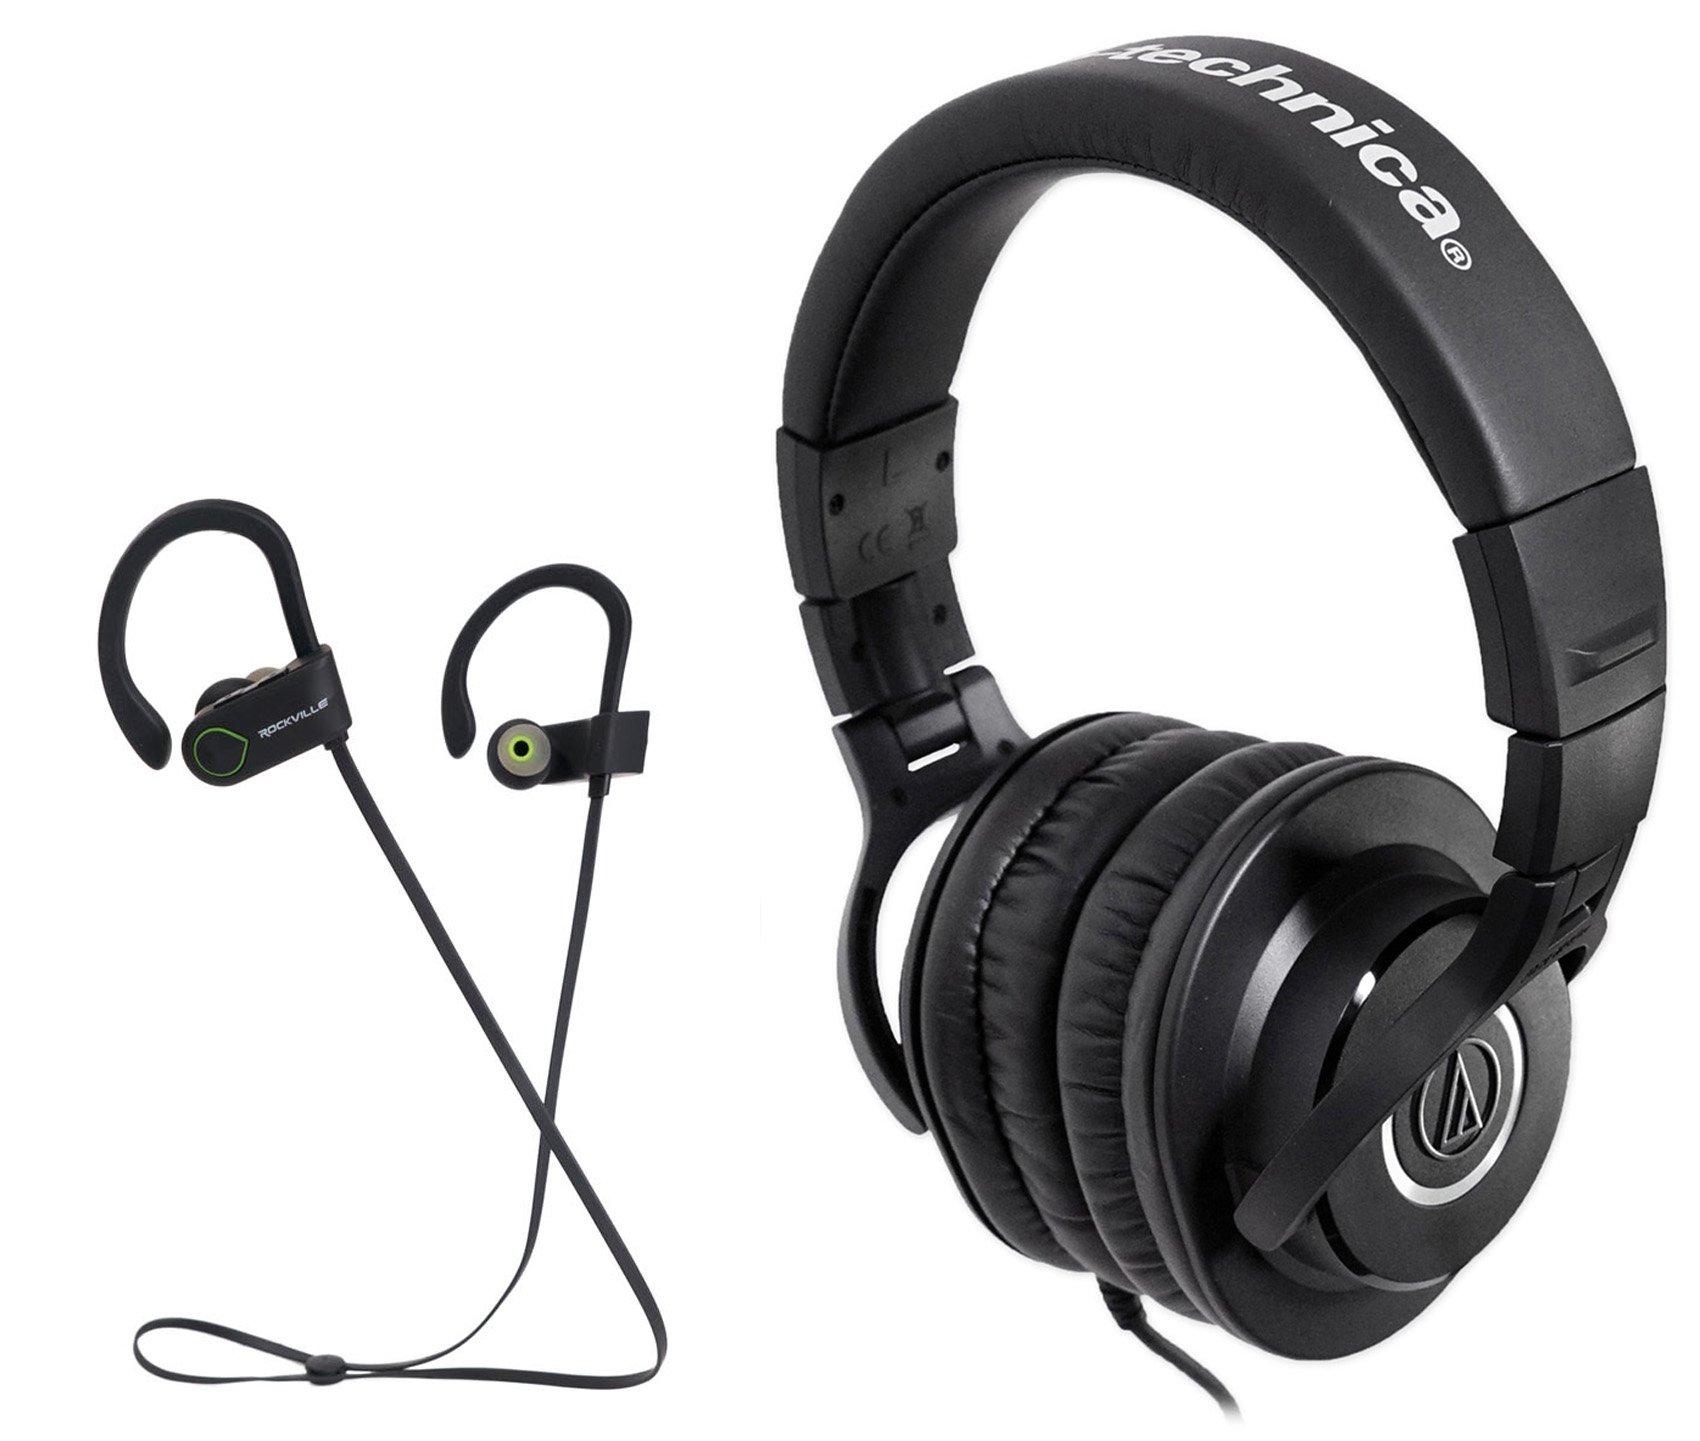 Audio Technica ATH-M40x Dynamic Studio Monitor headphones ATHM40x+ Earbuds